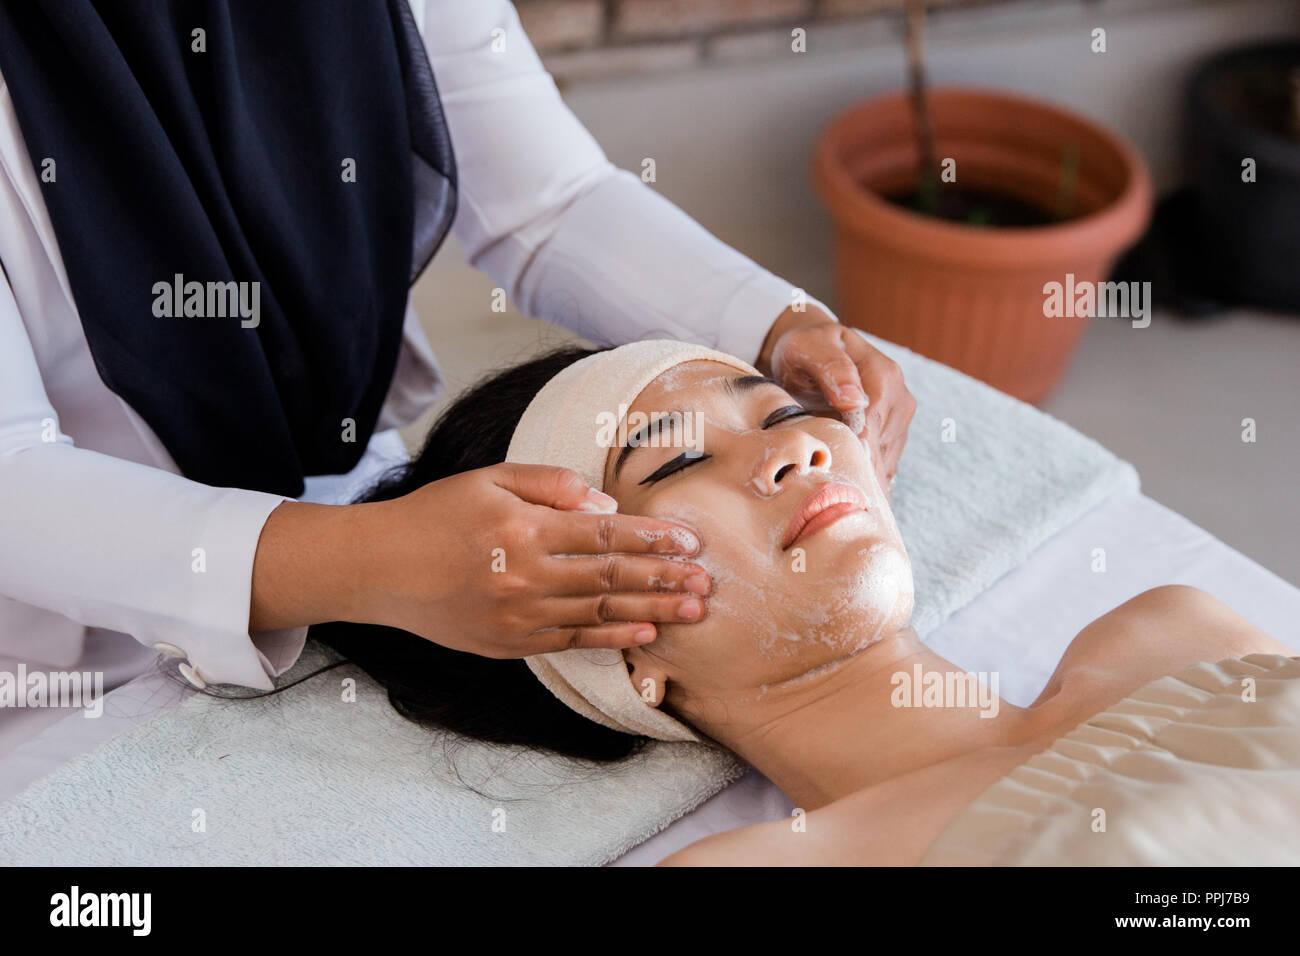 Young woman enjoying massage avec crème masque Photo Stock